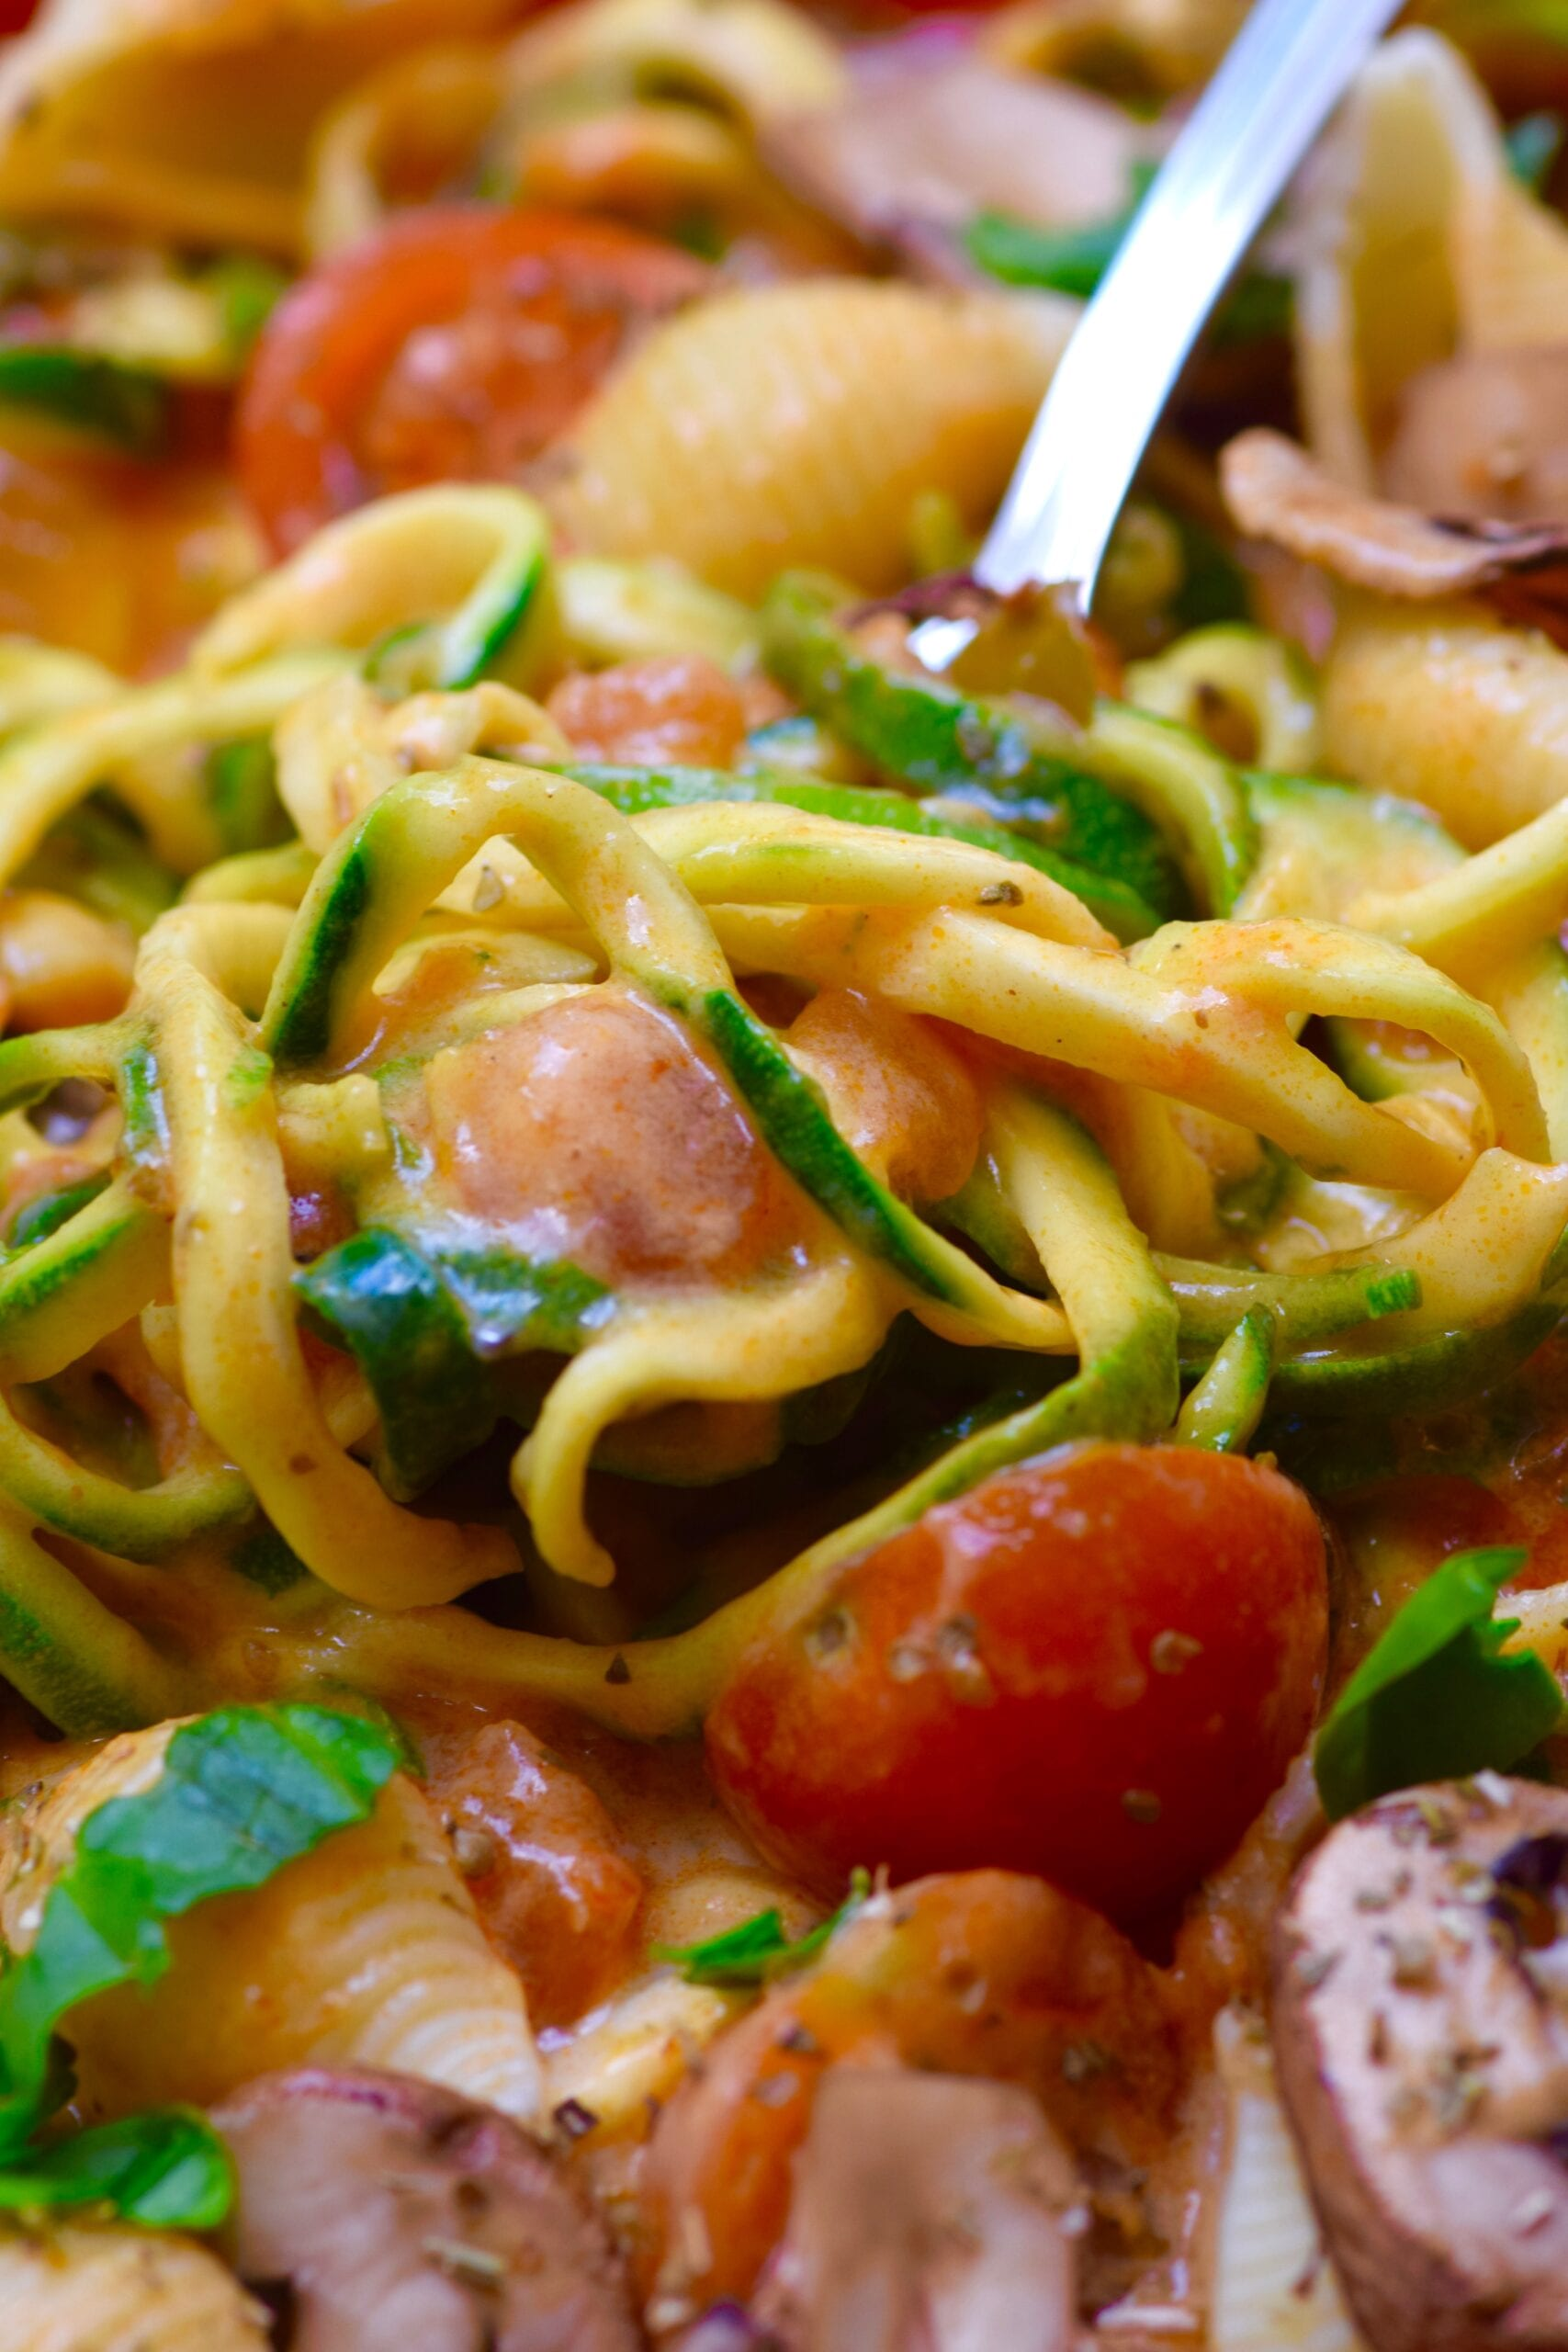 Creamy zucchini tomato pasta with a fork inside